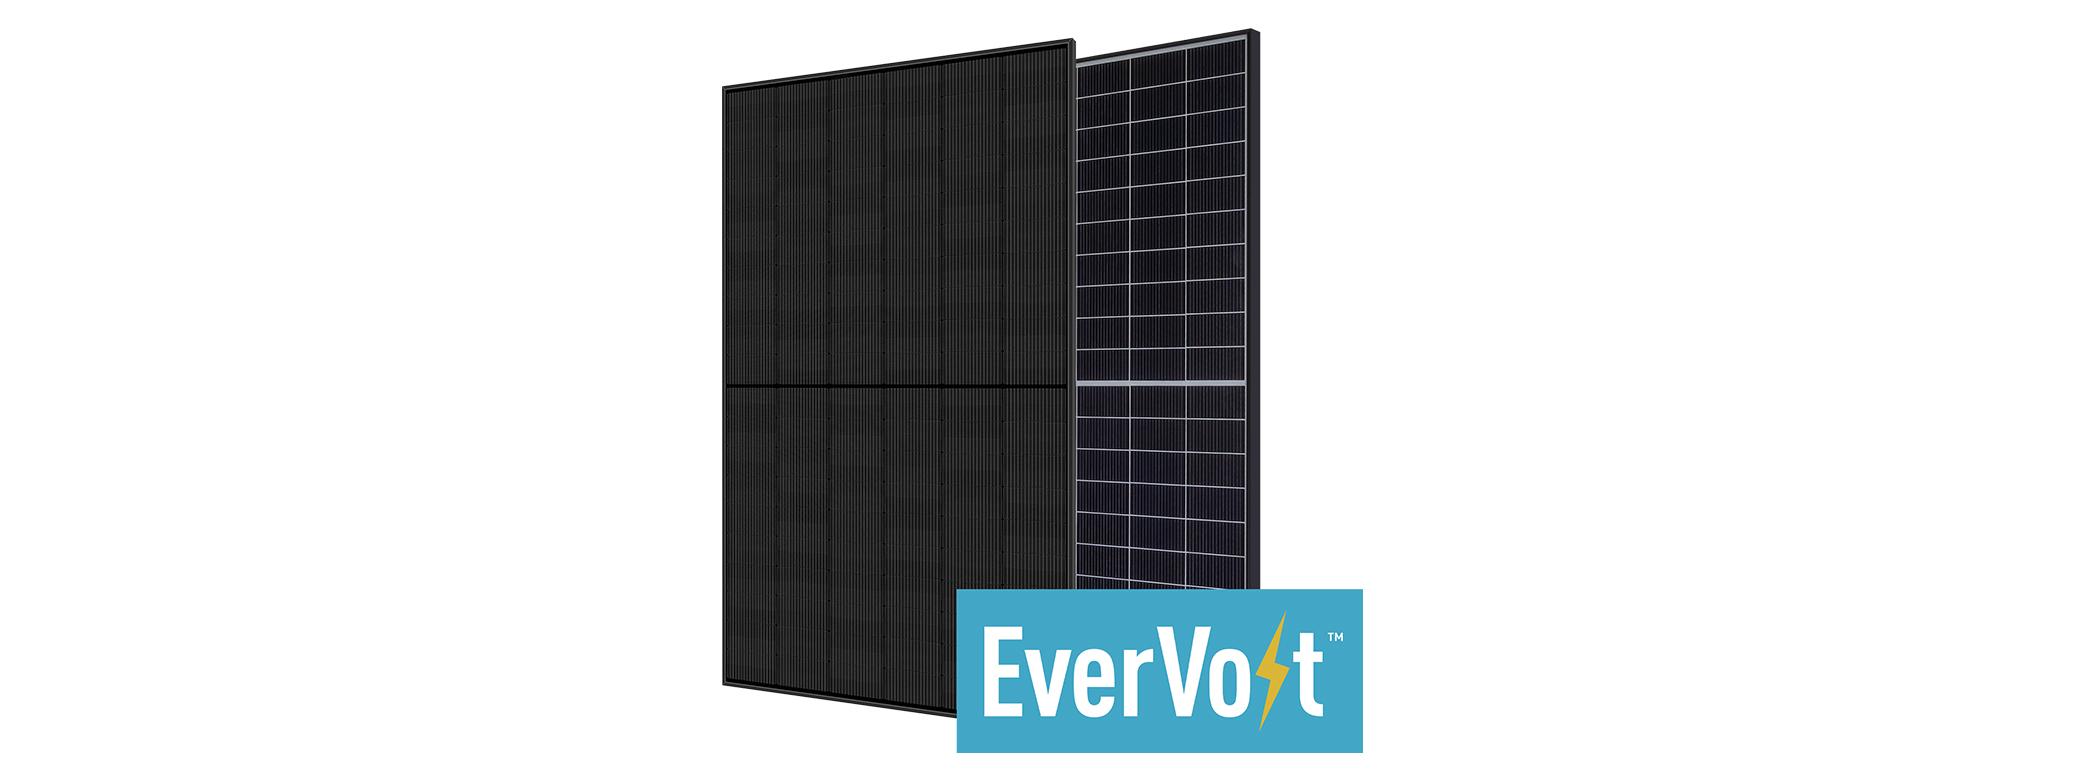 EverVoltPanels-new-logo-resized.png